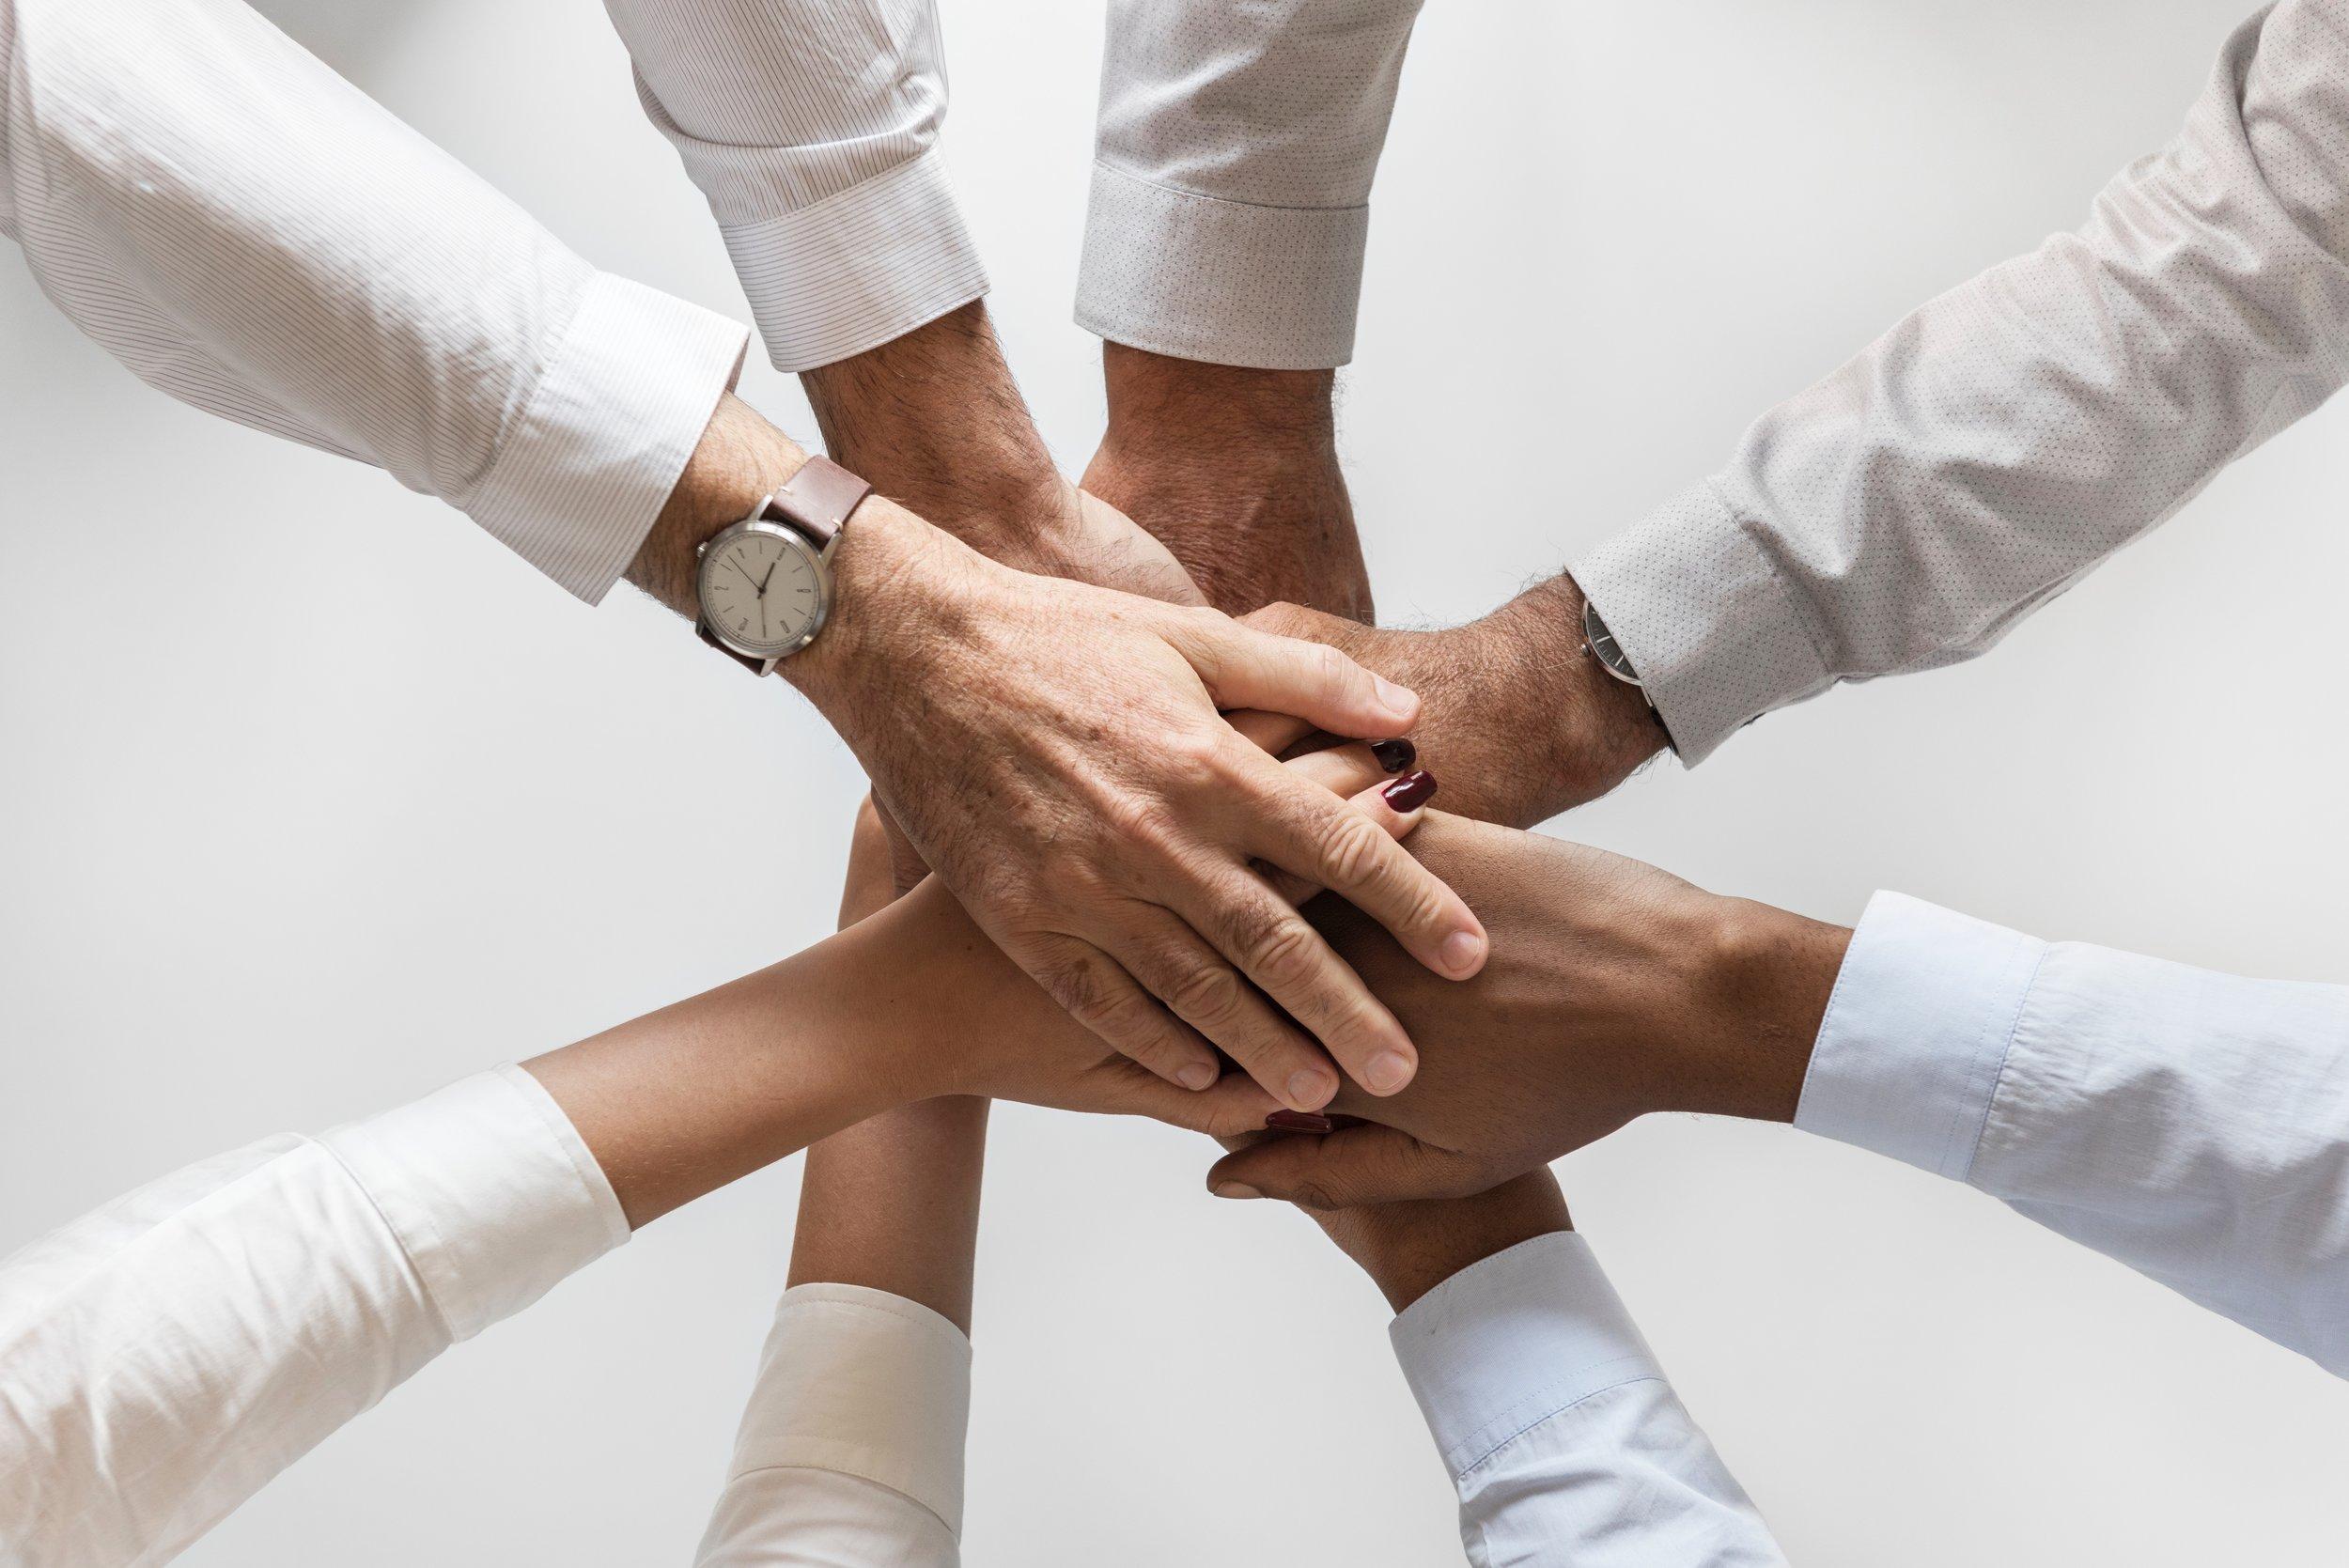 workplacenegativity-leadership-fightingnegativity.jpg